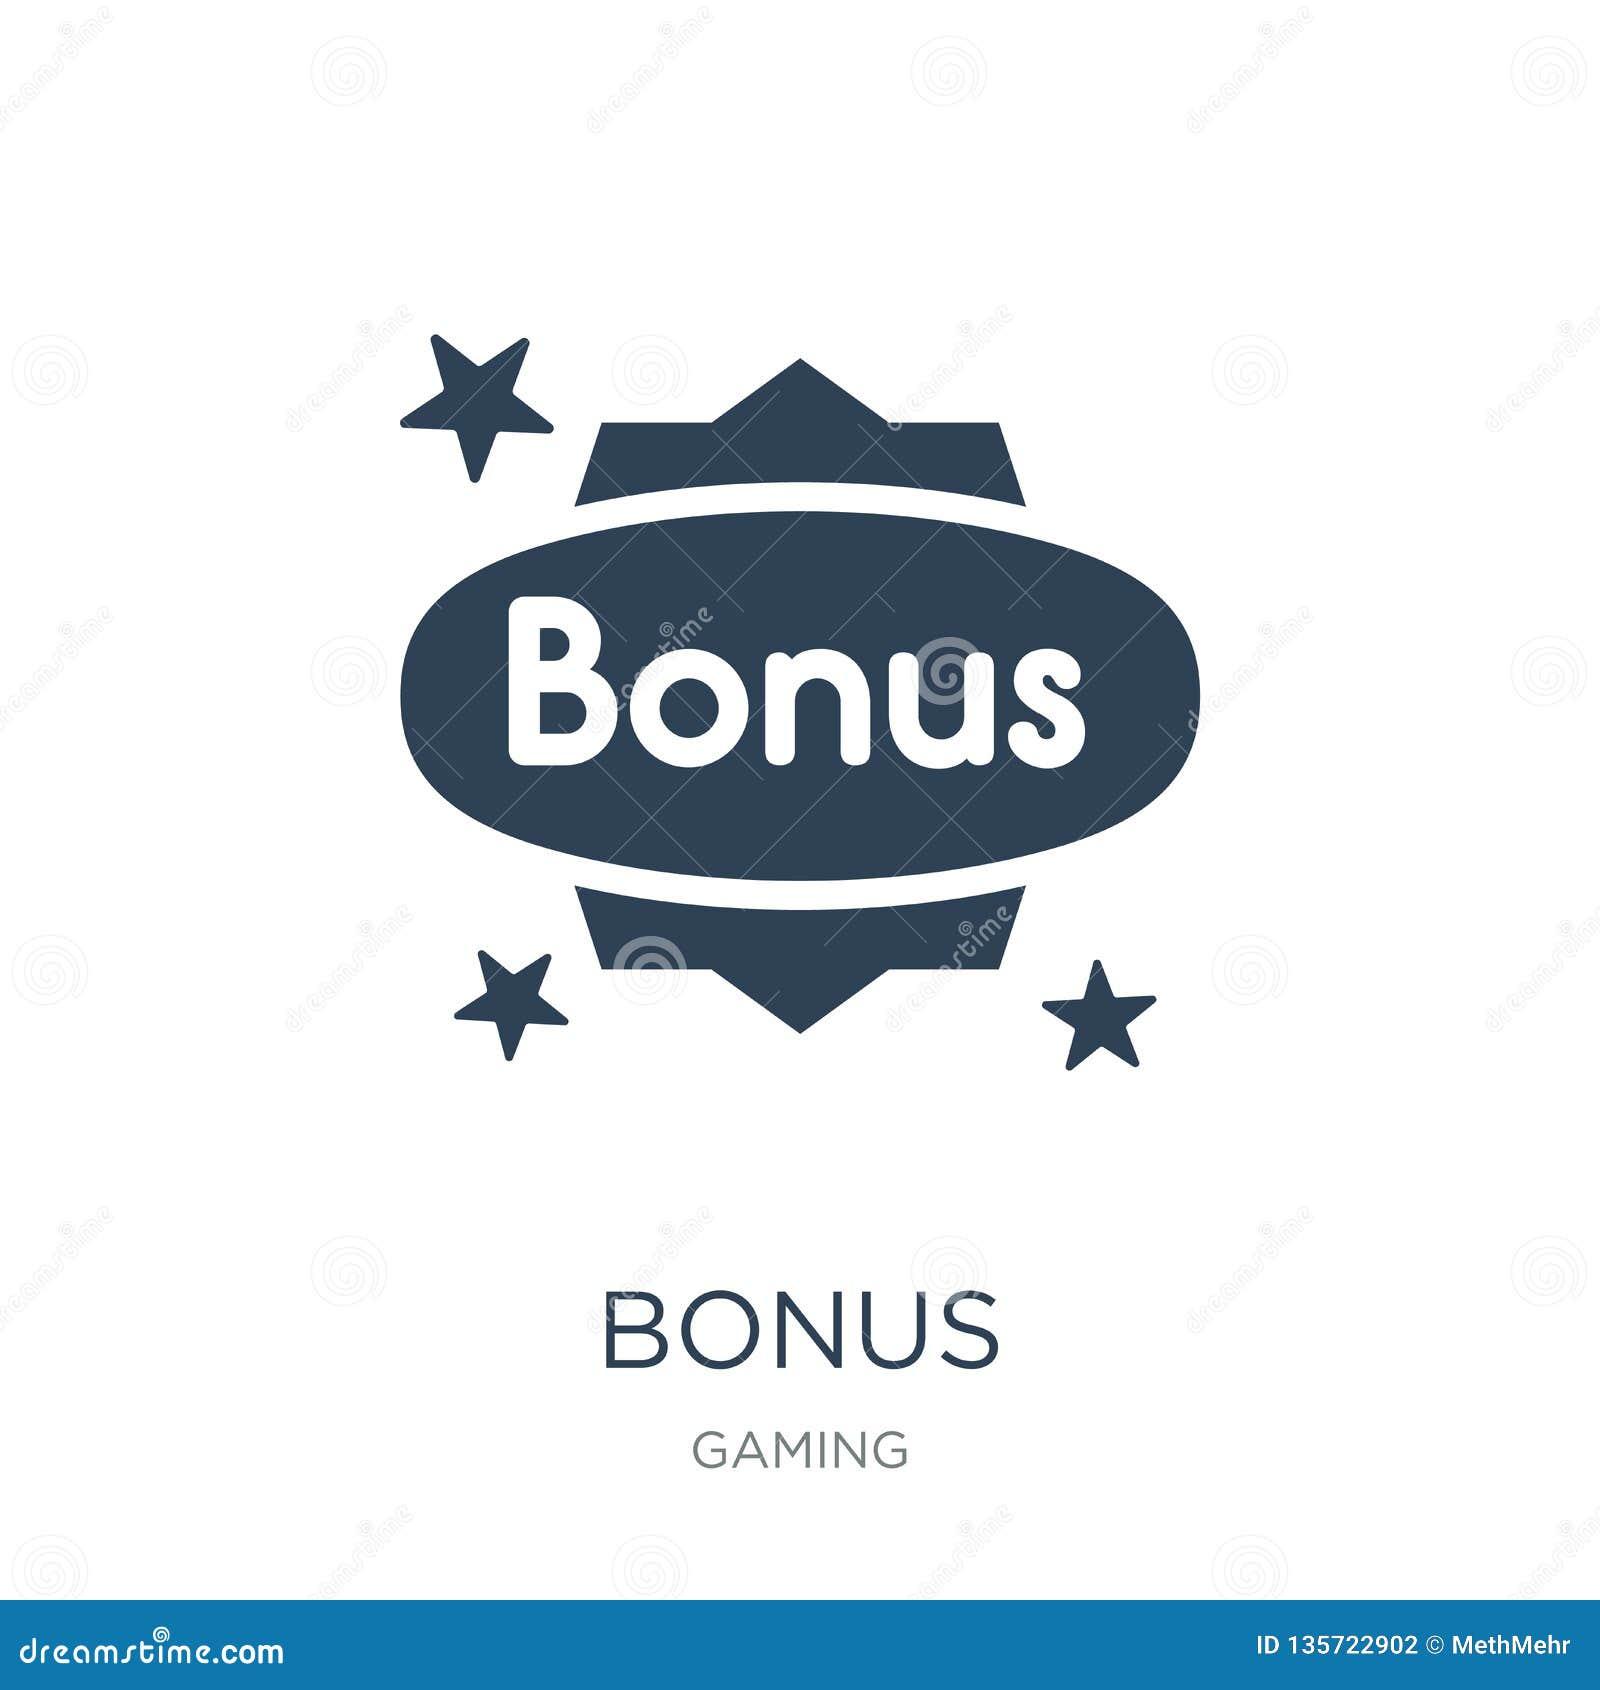 bonus icon in trendy design style. bonus icon isolated on white background. bonus vector icon simple and modern flat symbol for